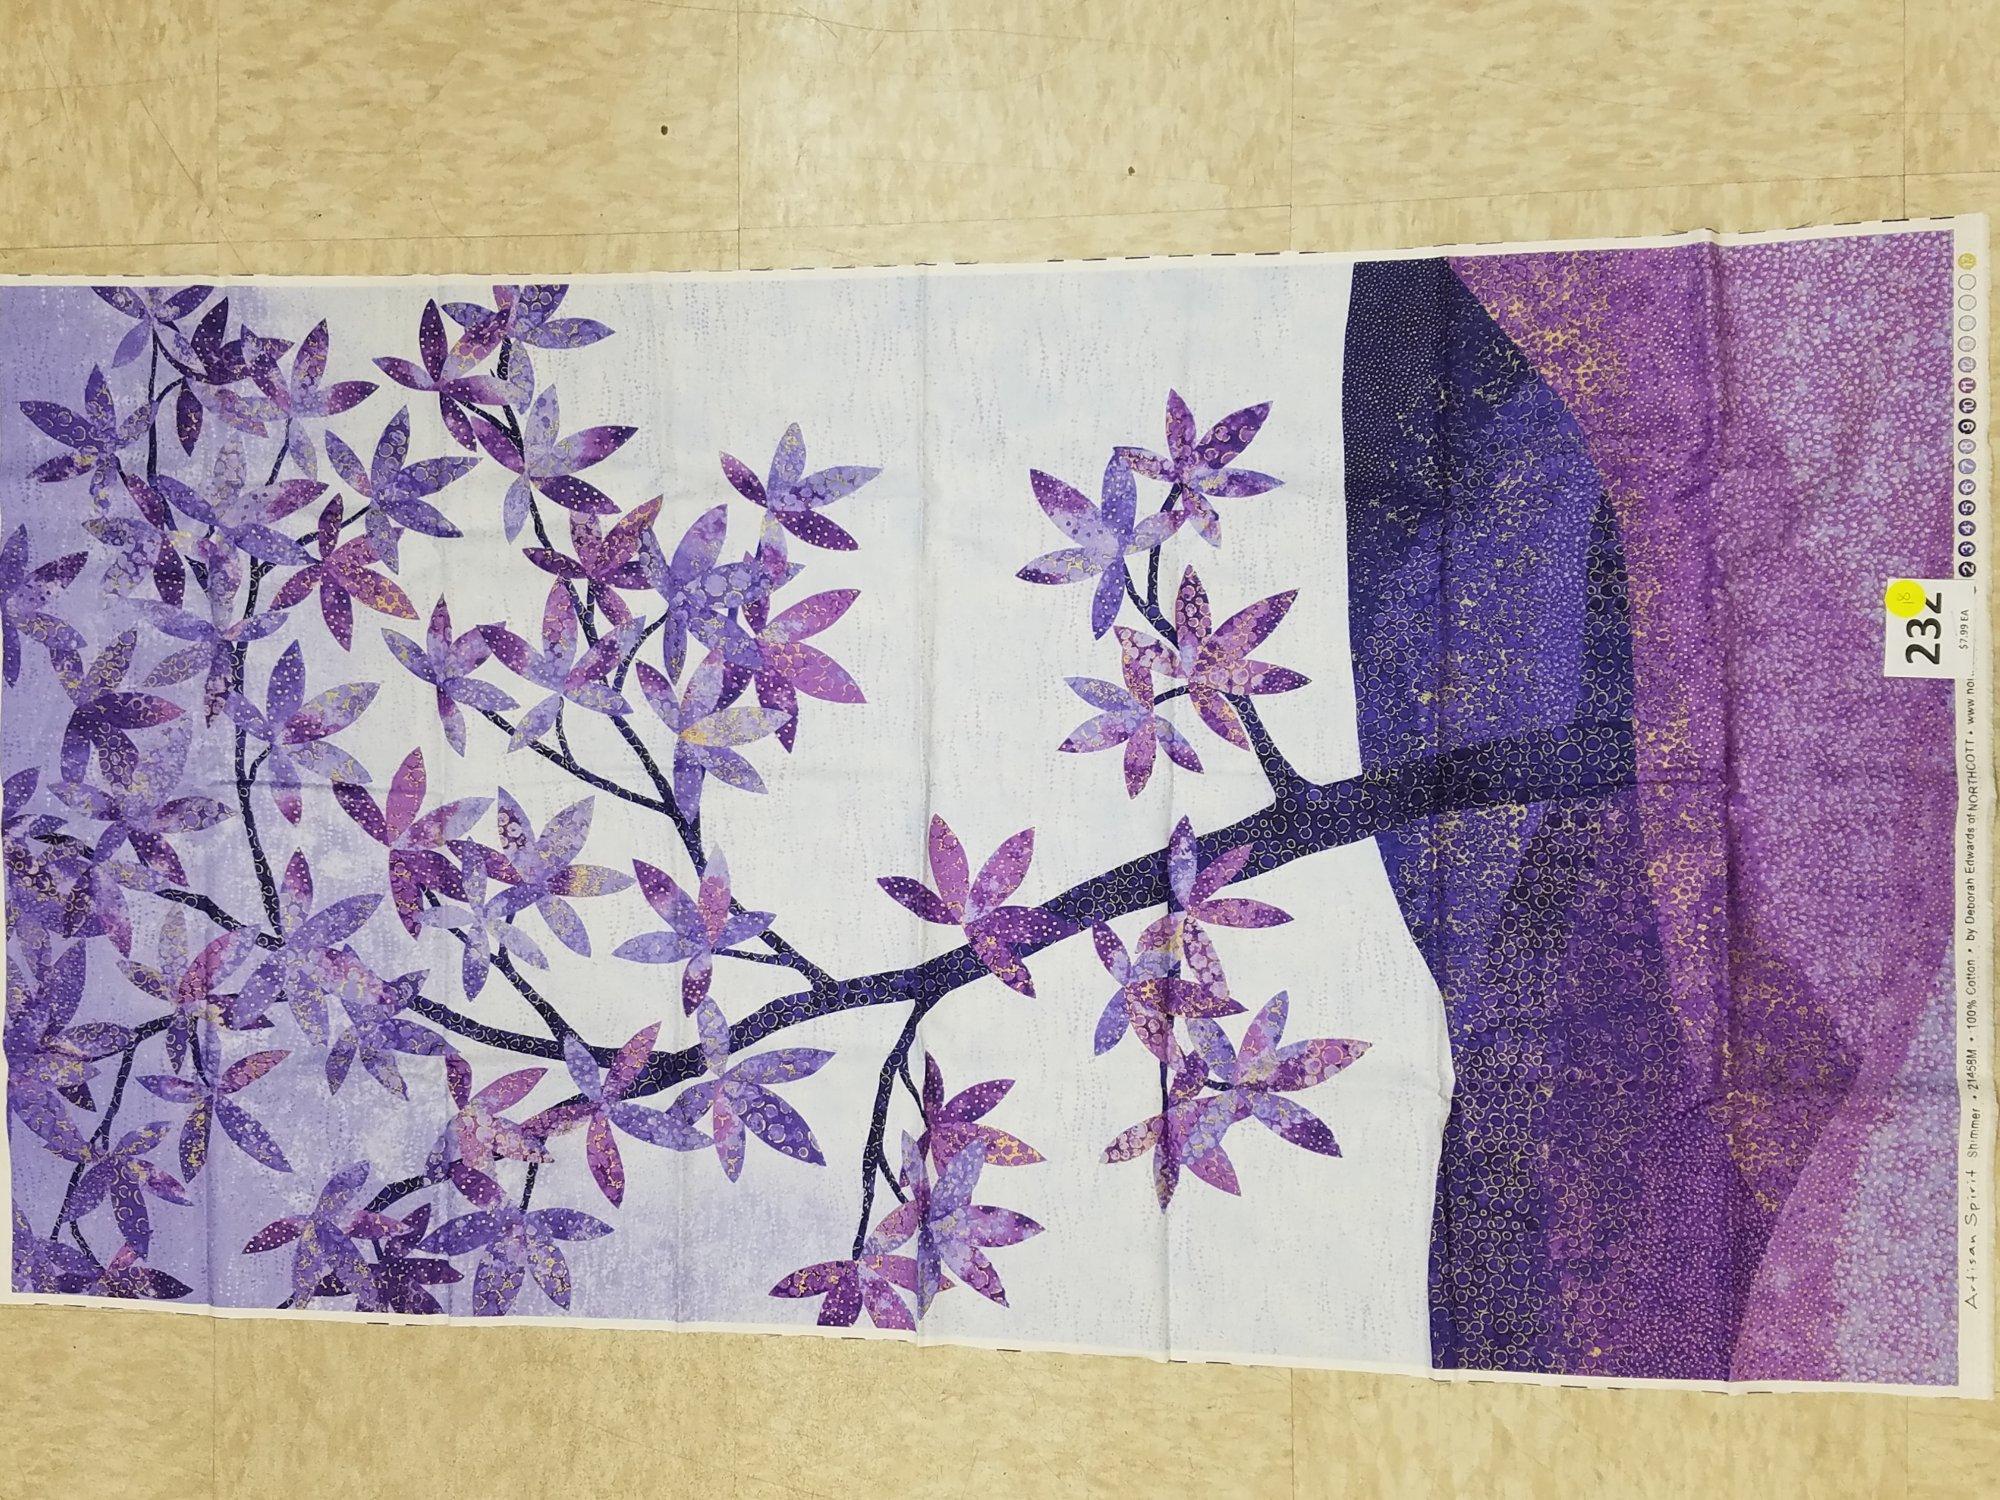 panel 232 shimmer echos purple tree